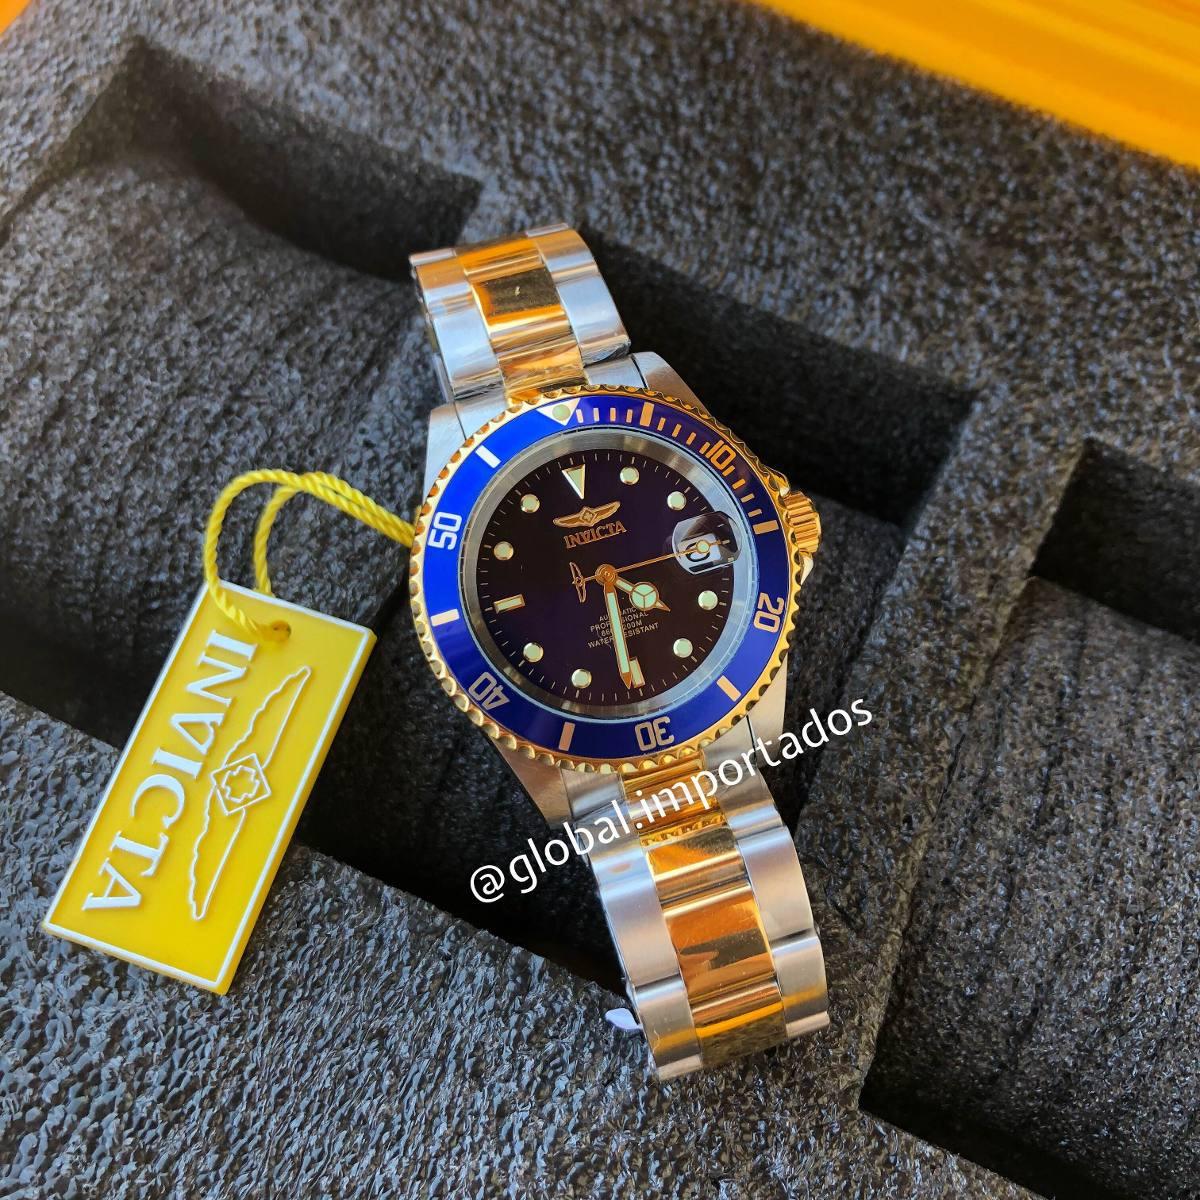 efb96856c06 relógio invicta pro diver original 8928ob. Carregando zoom.